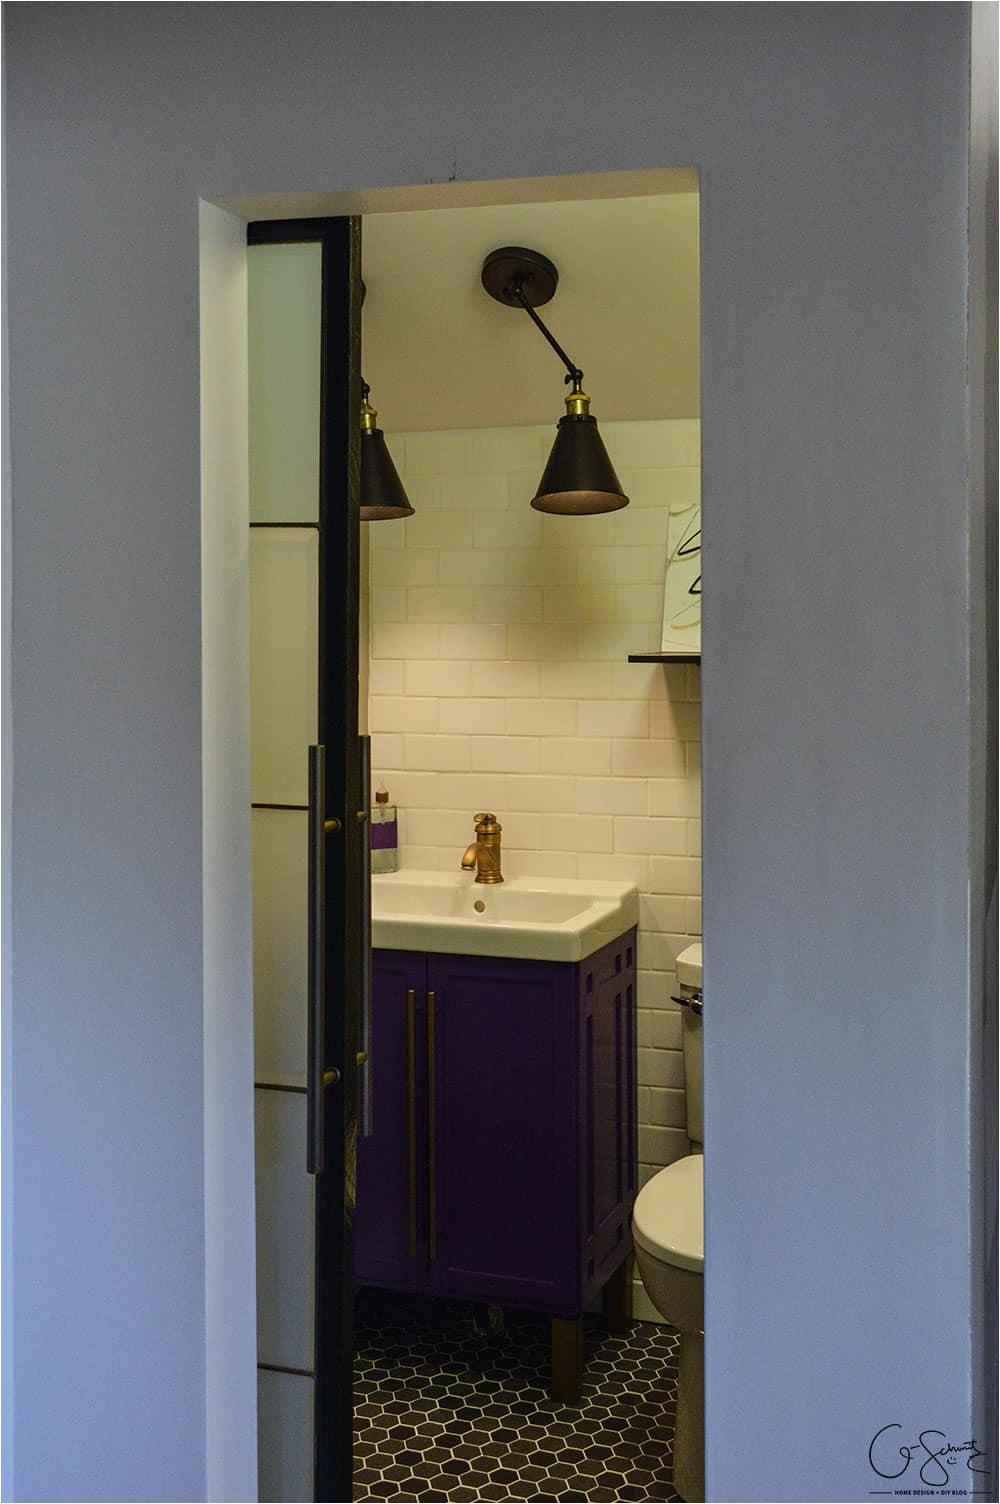 can i use a barn door for a bathroom